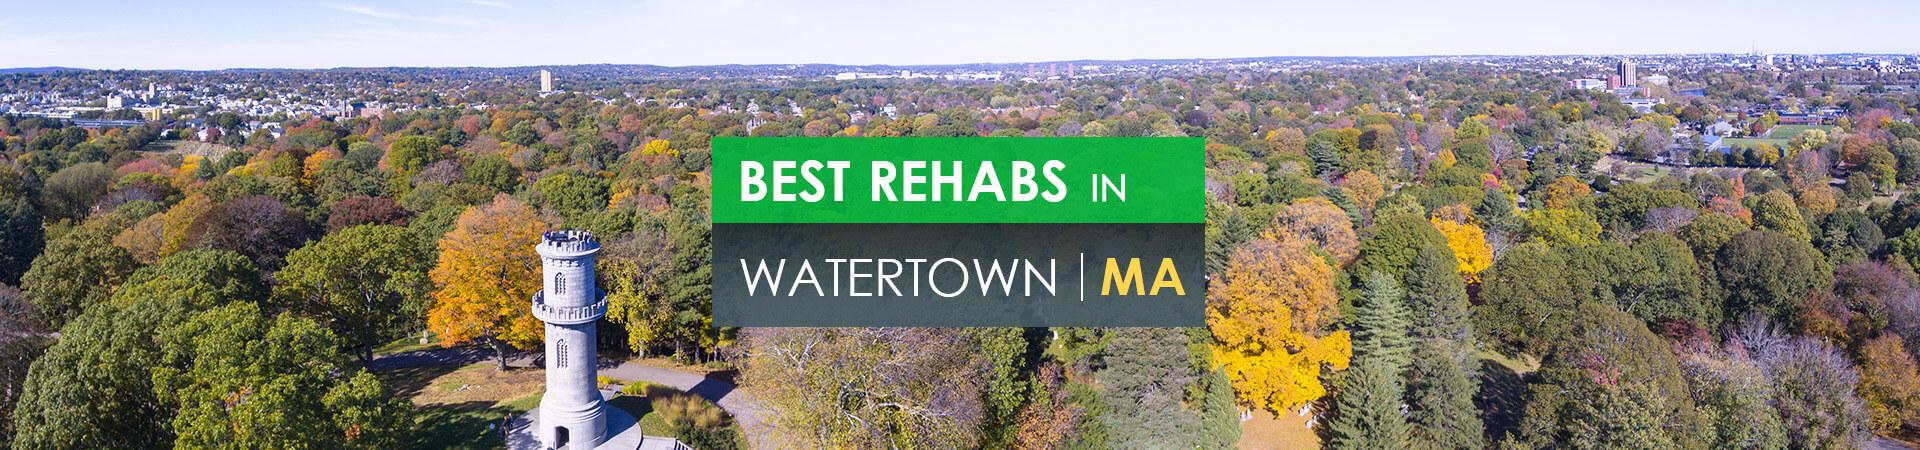 Best rehabs in Watertown, MA